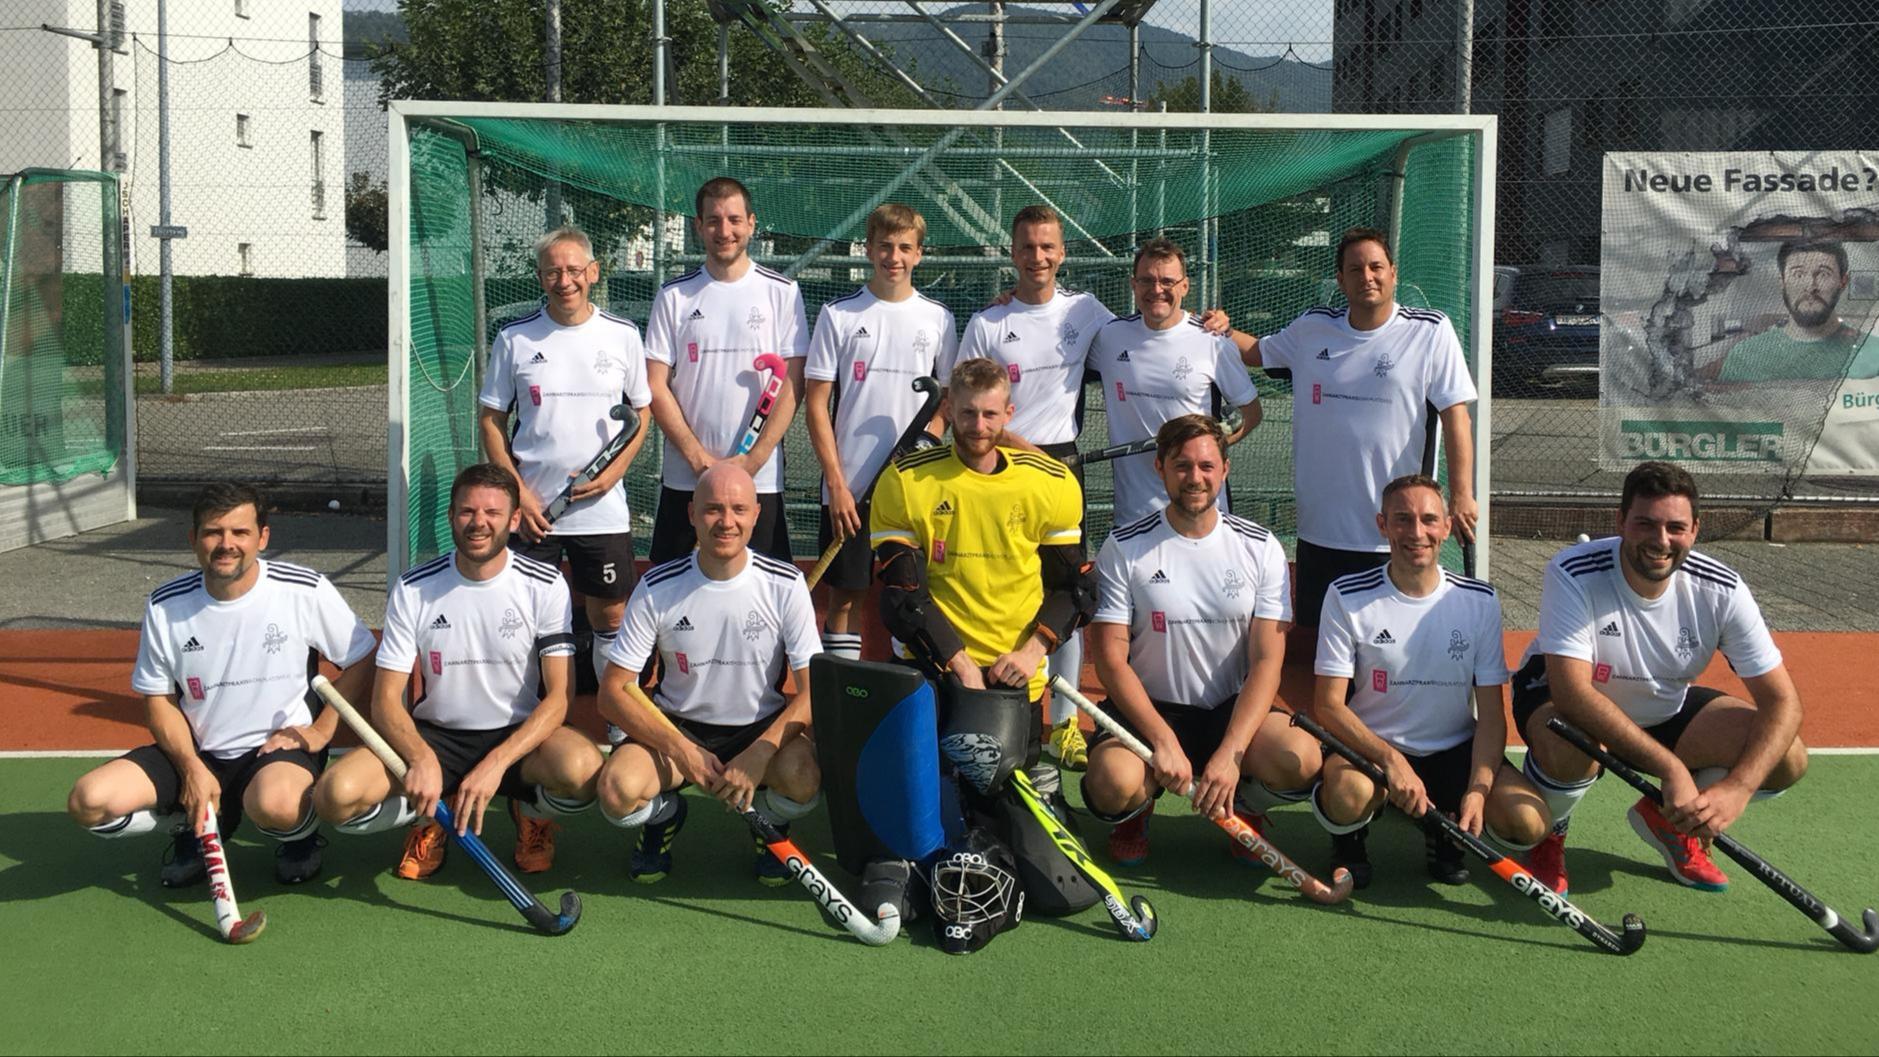 2019 Herren 1 NLA Halle+Feld